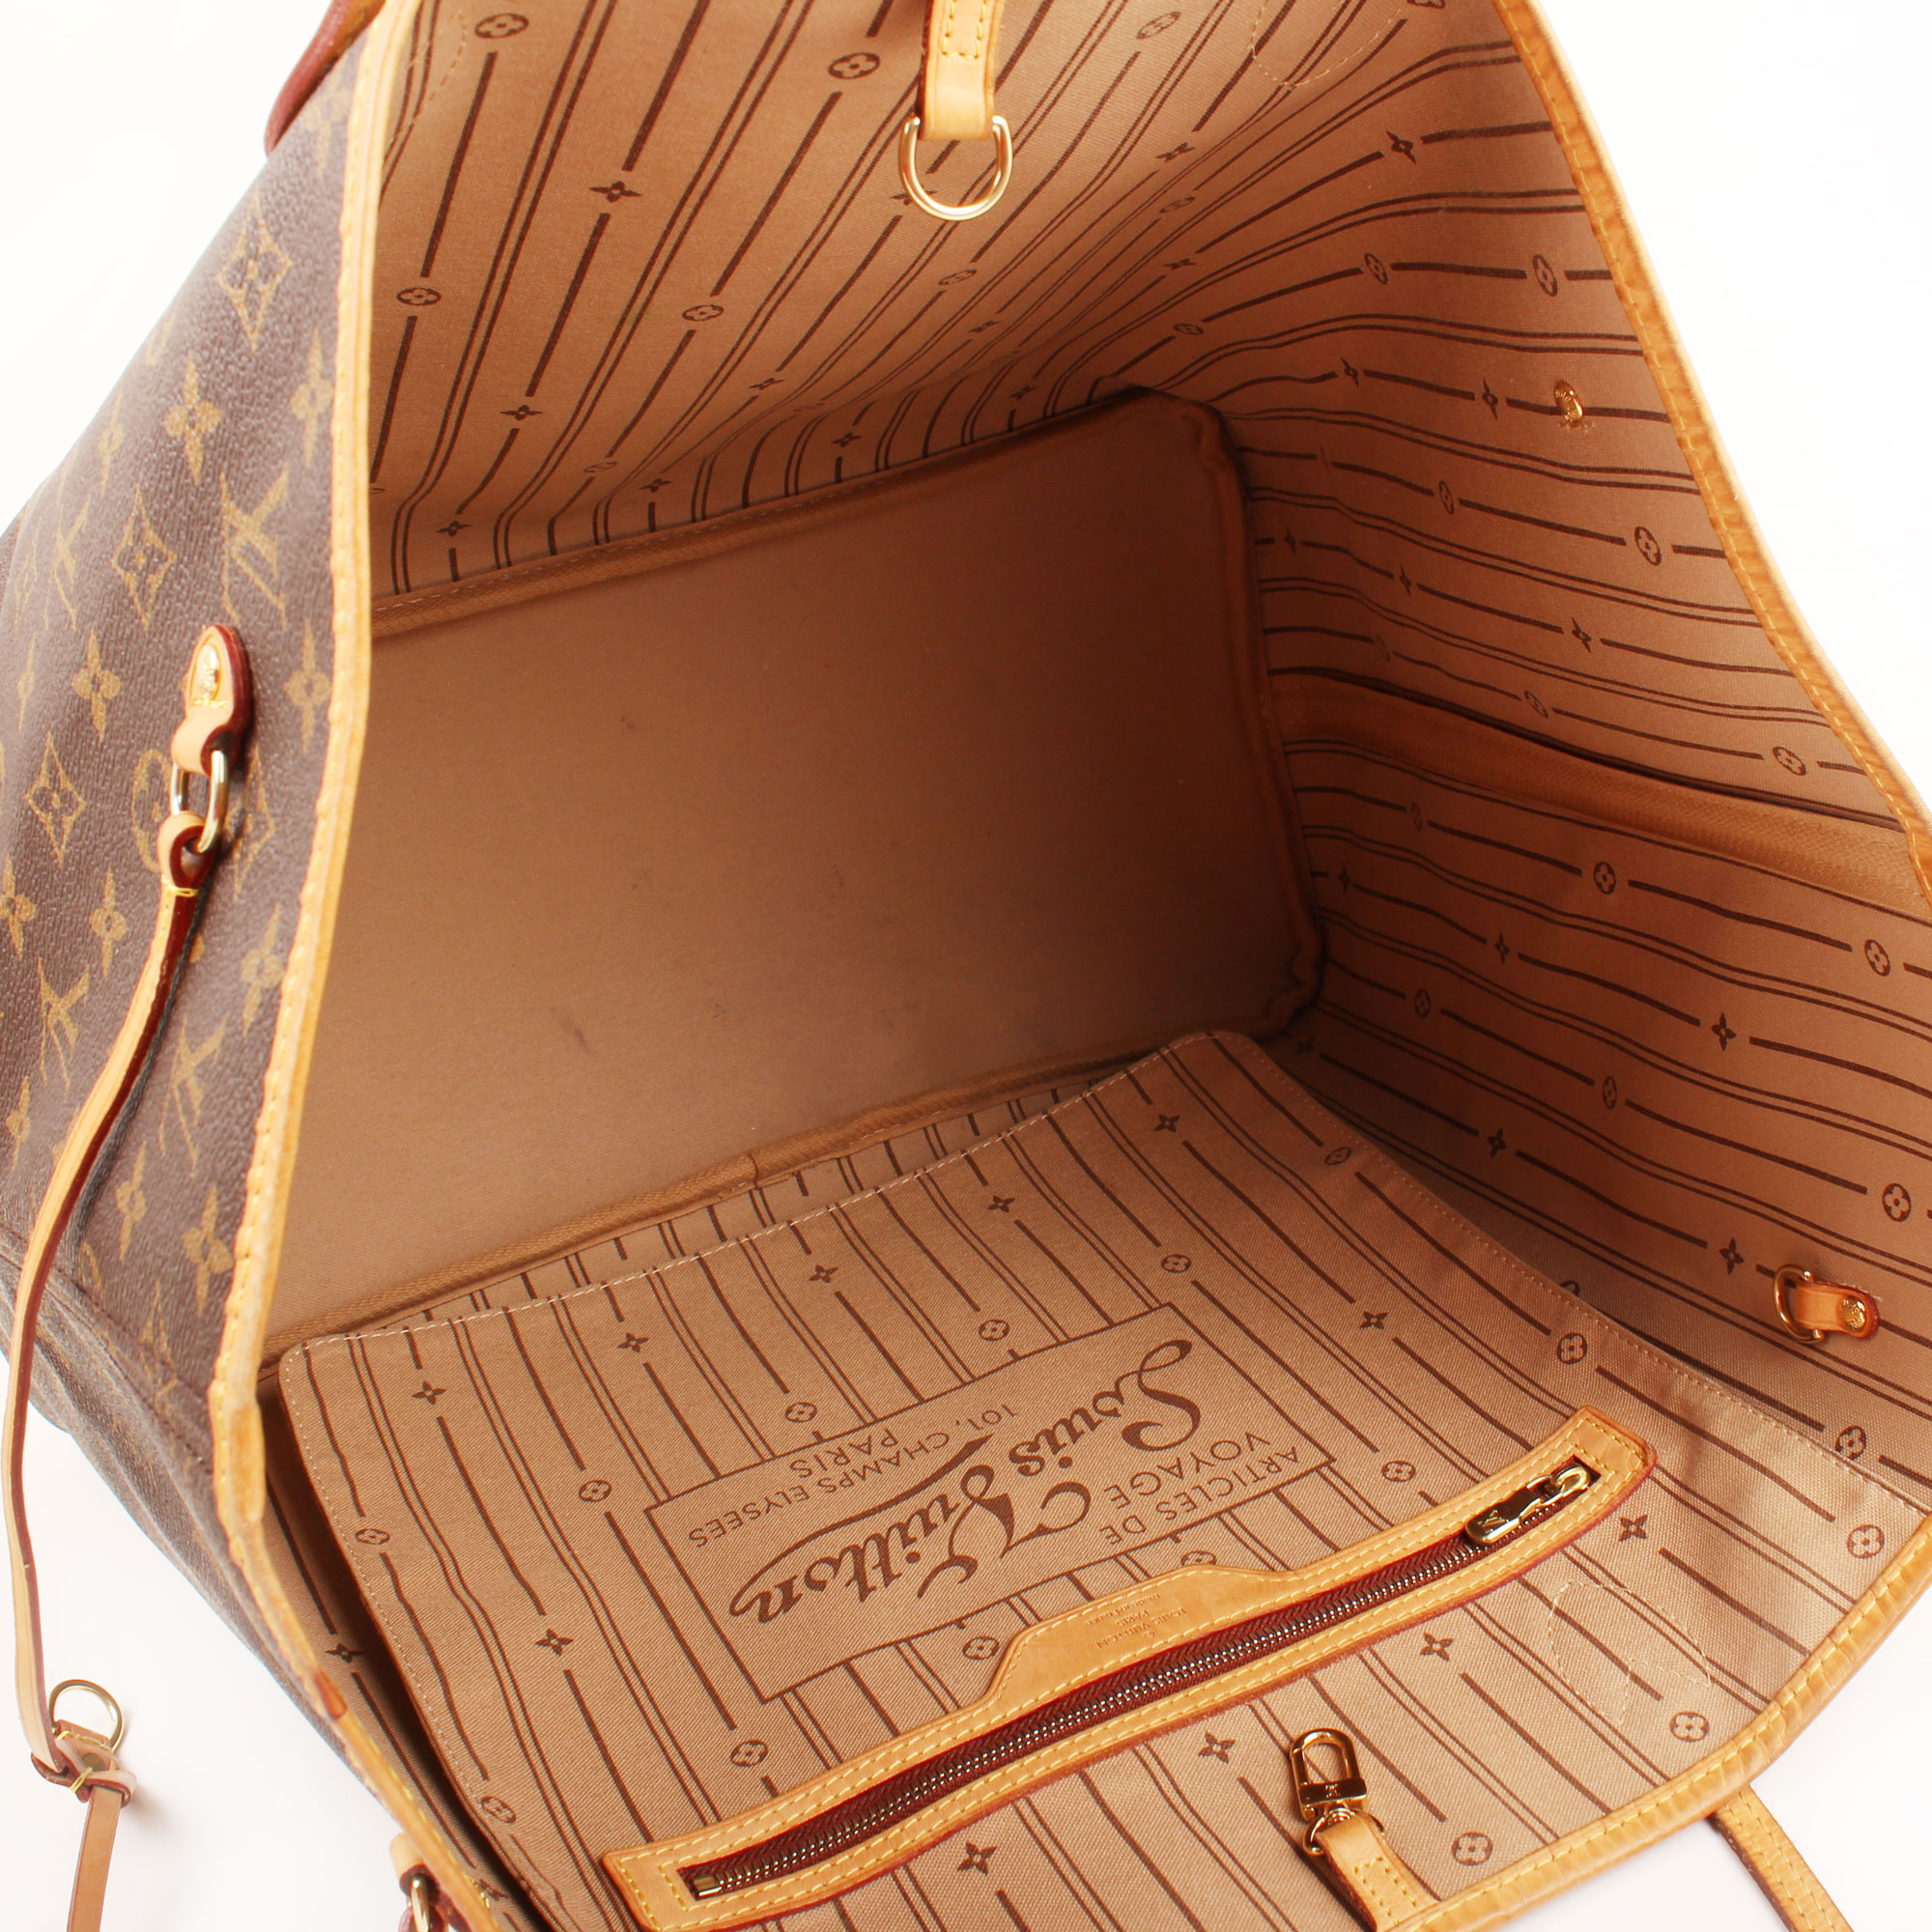 Imagen del interior del bolso louis vuitton neverfull gm monogram